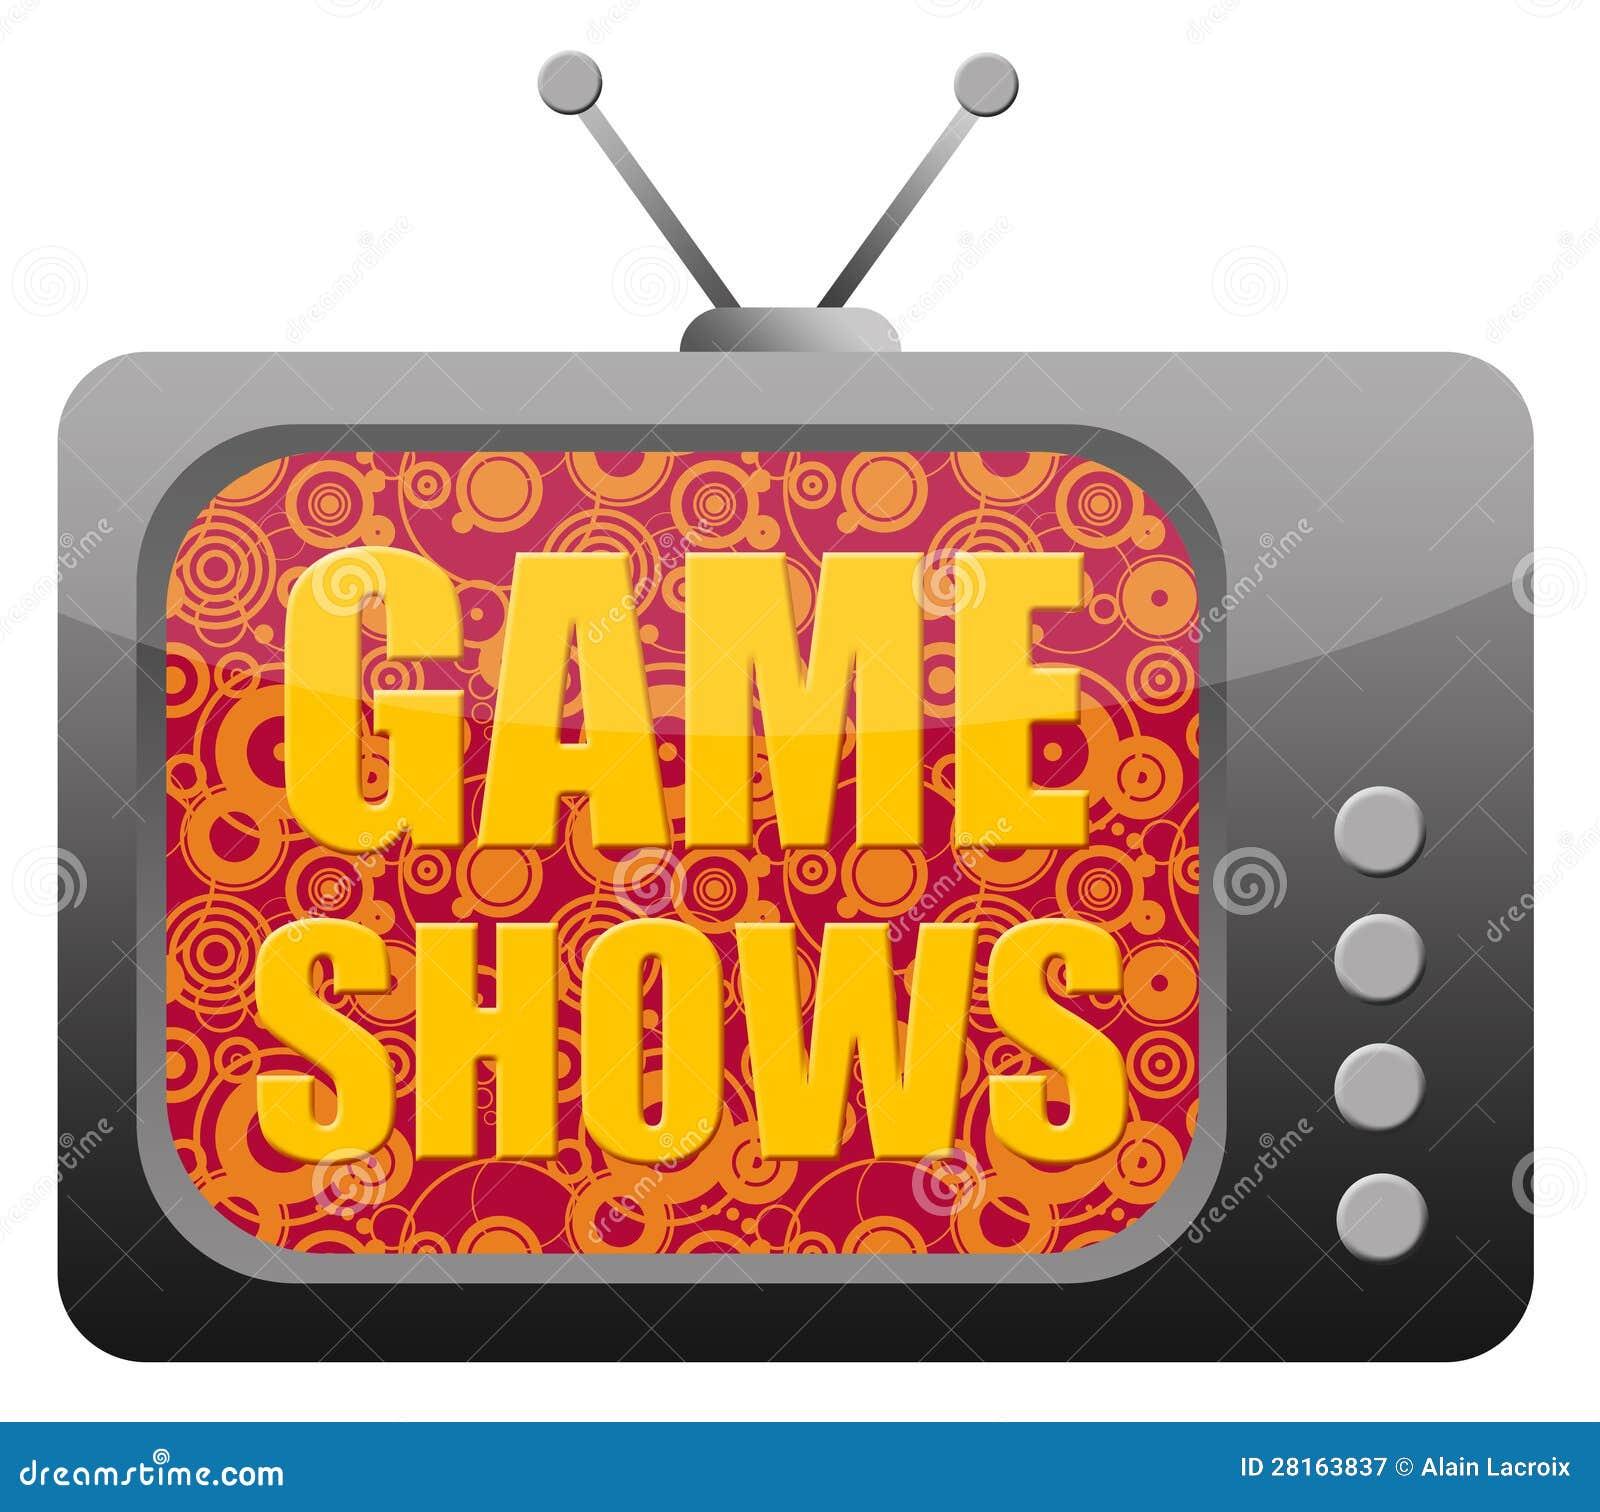 Free Tv Games